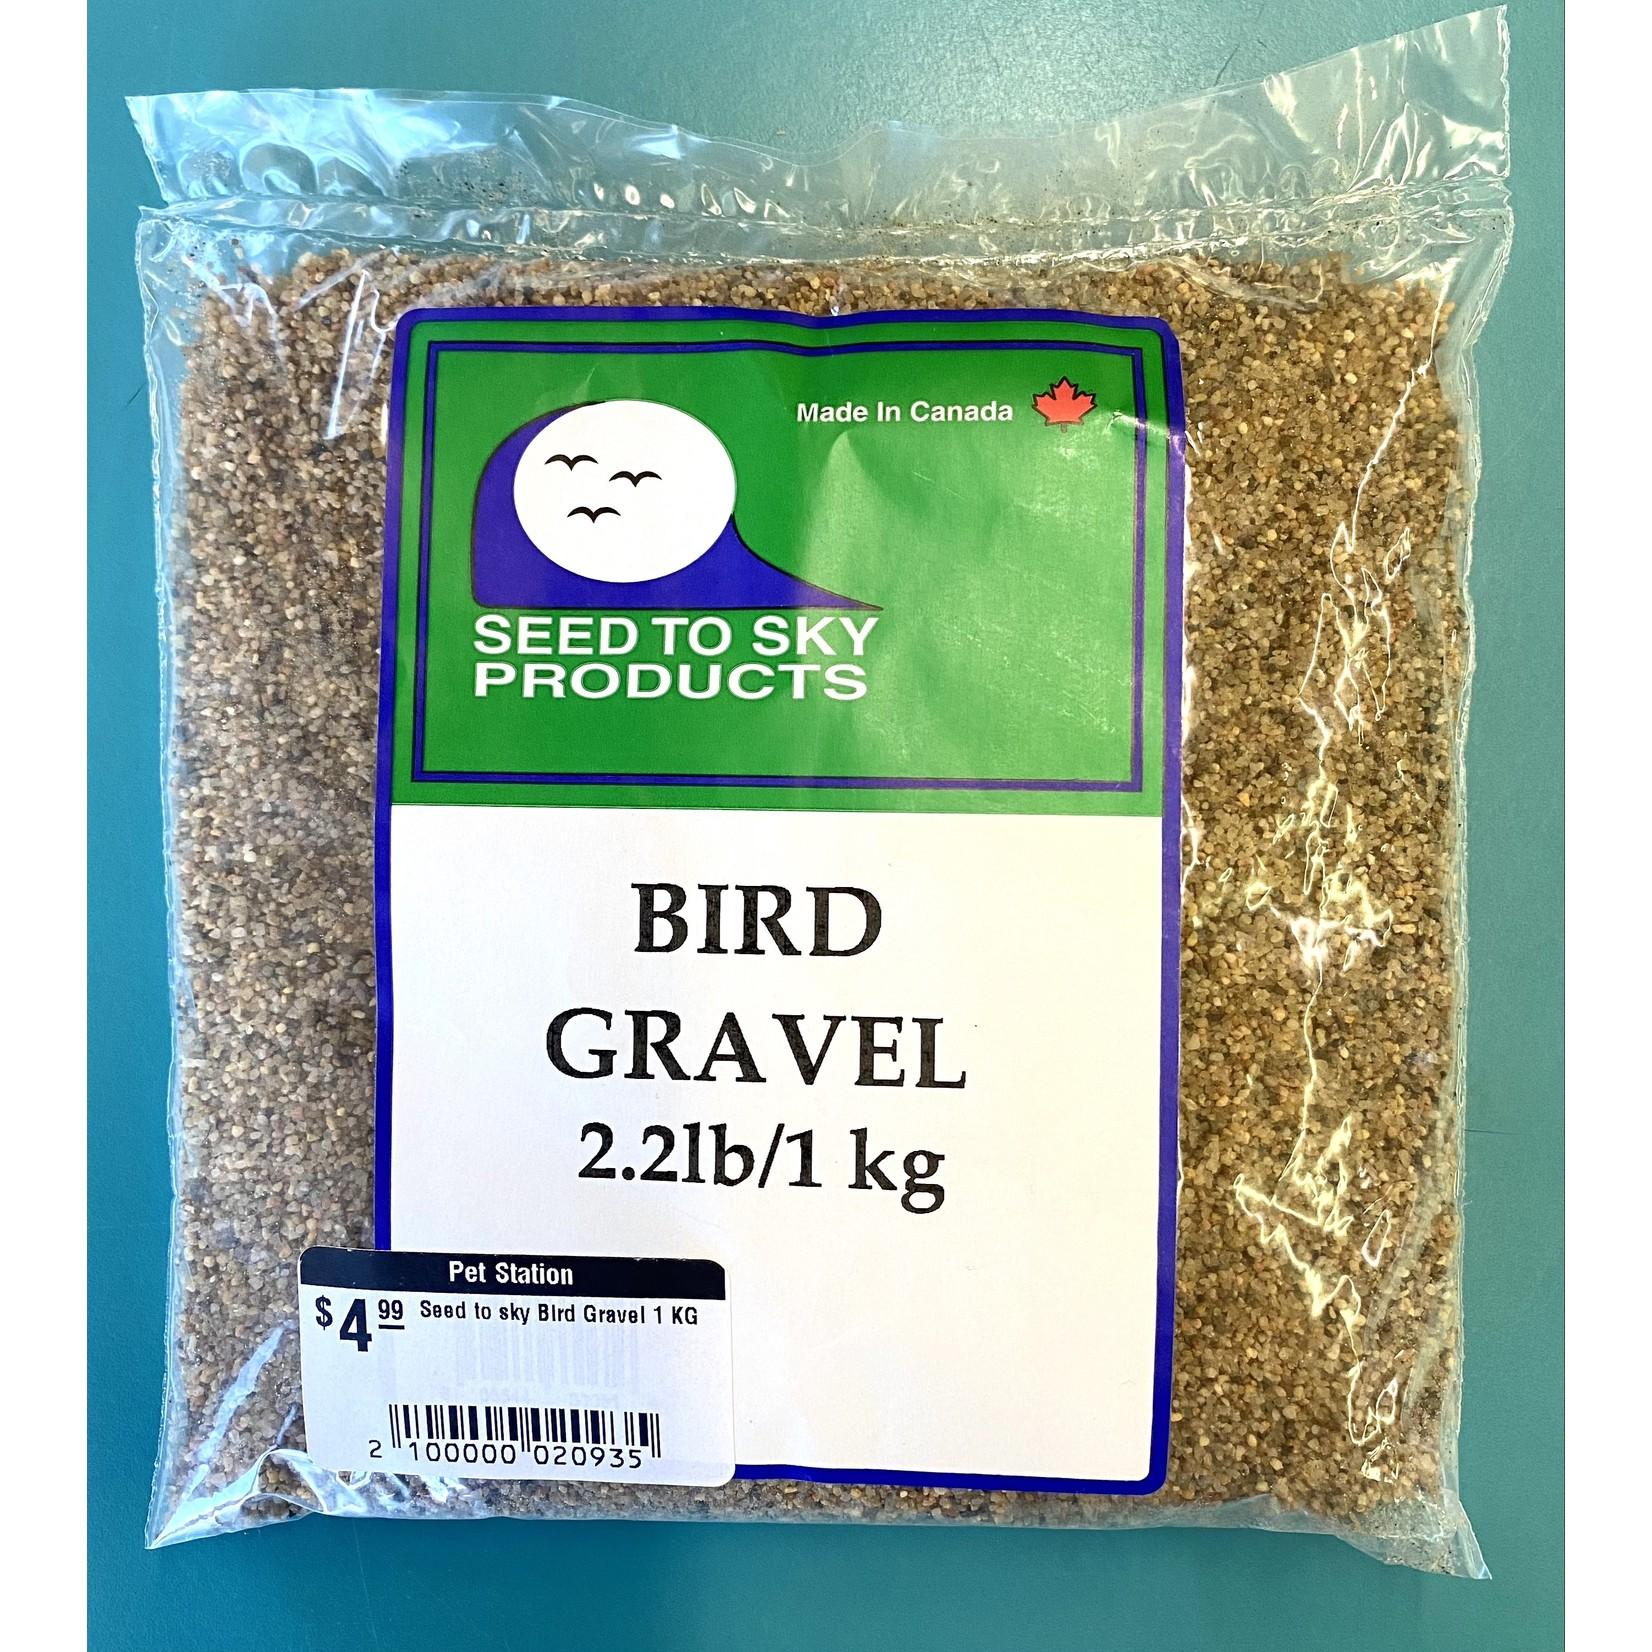 Seed to sky Bird Gravel 1 KG